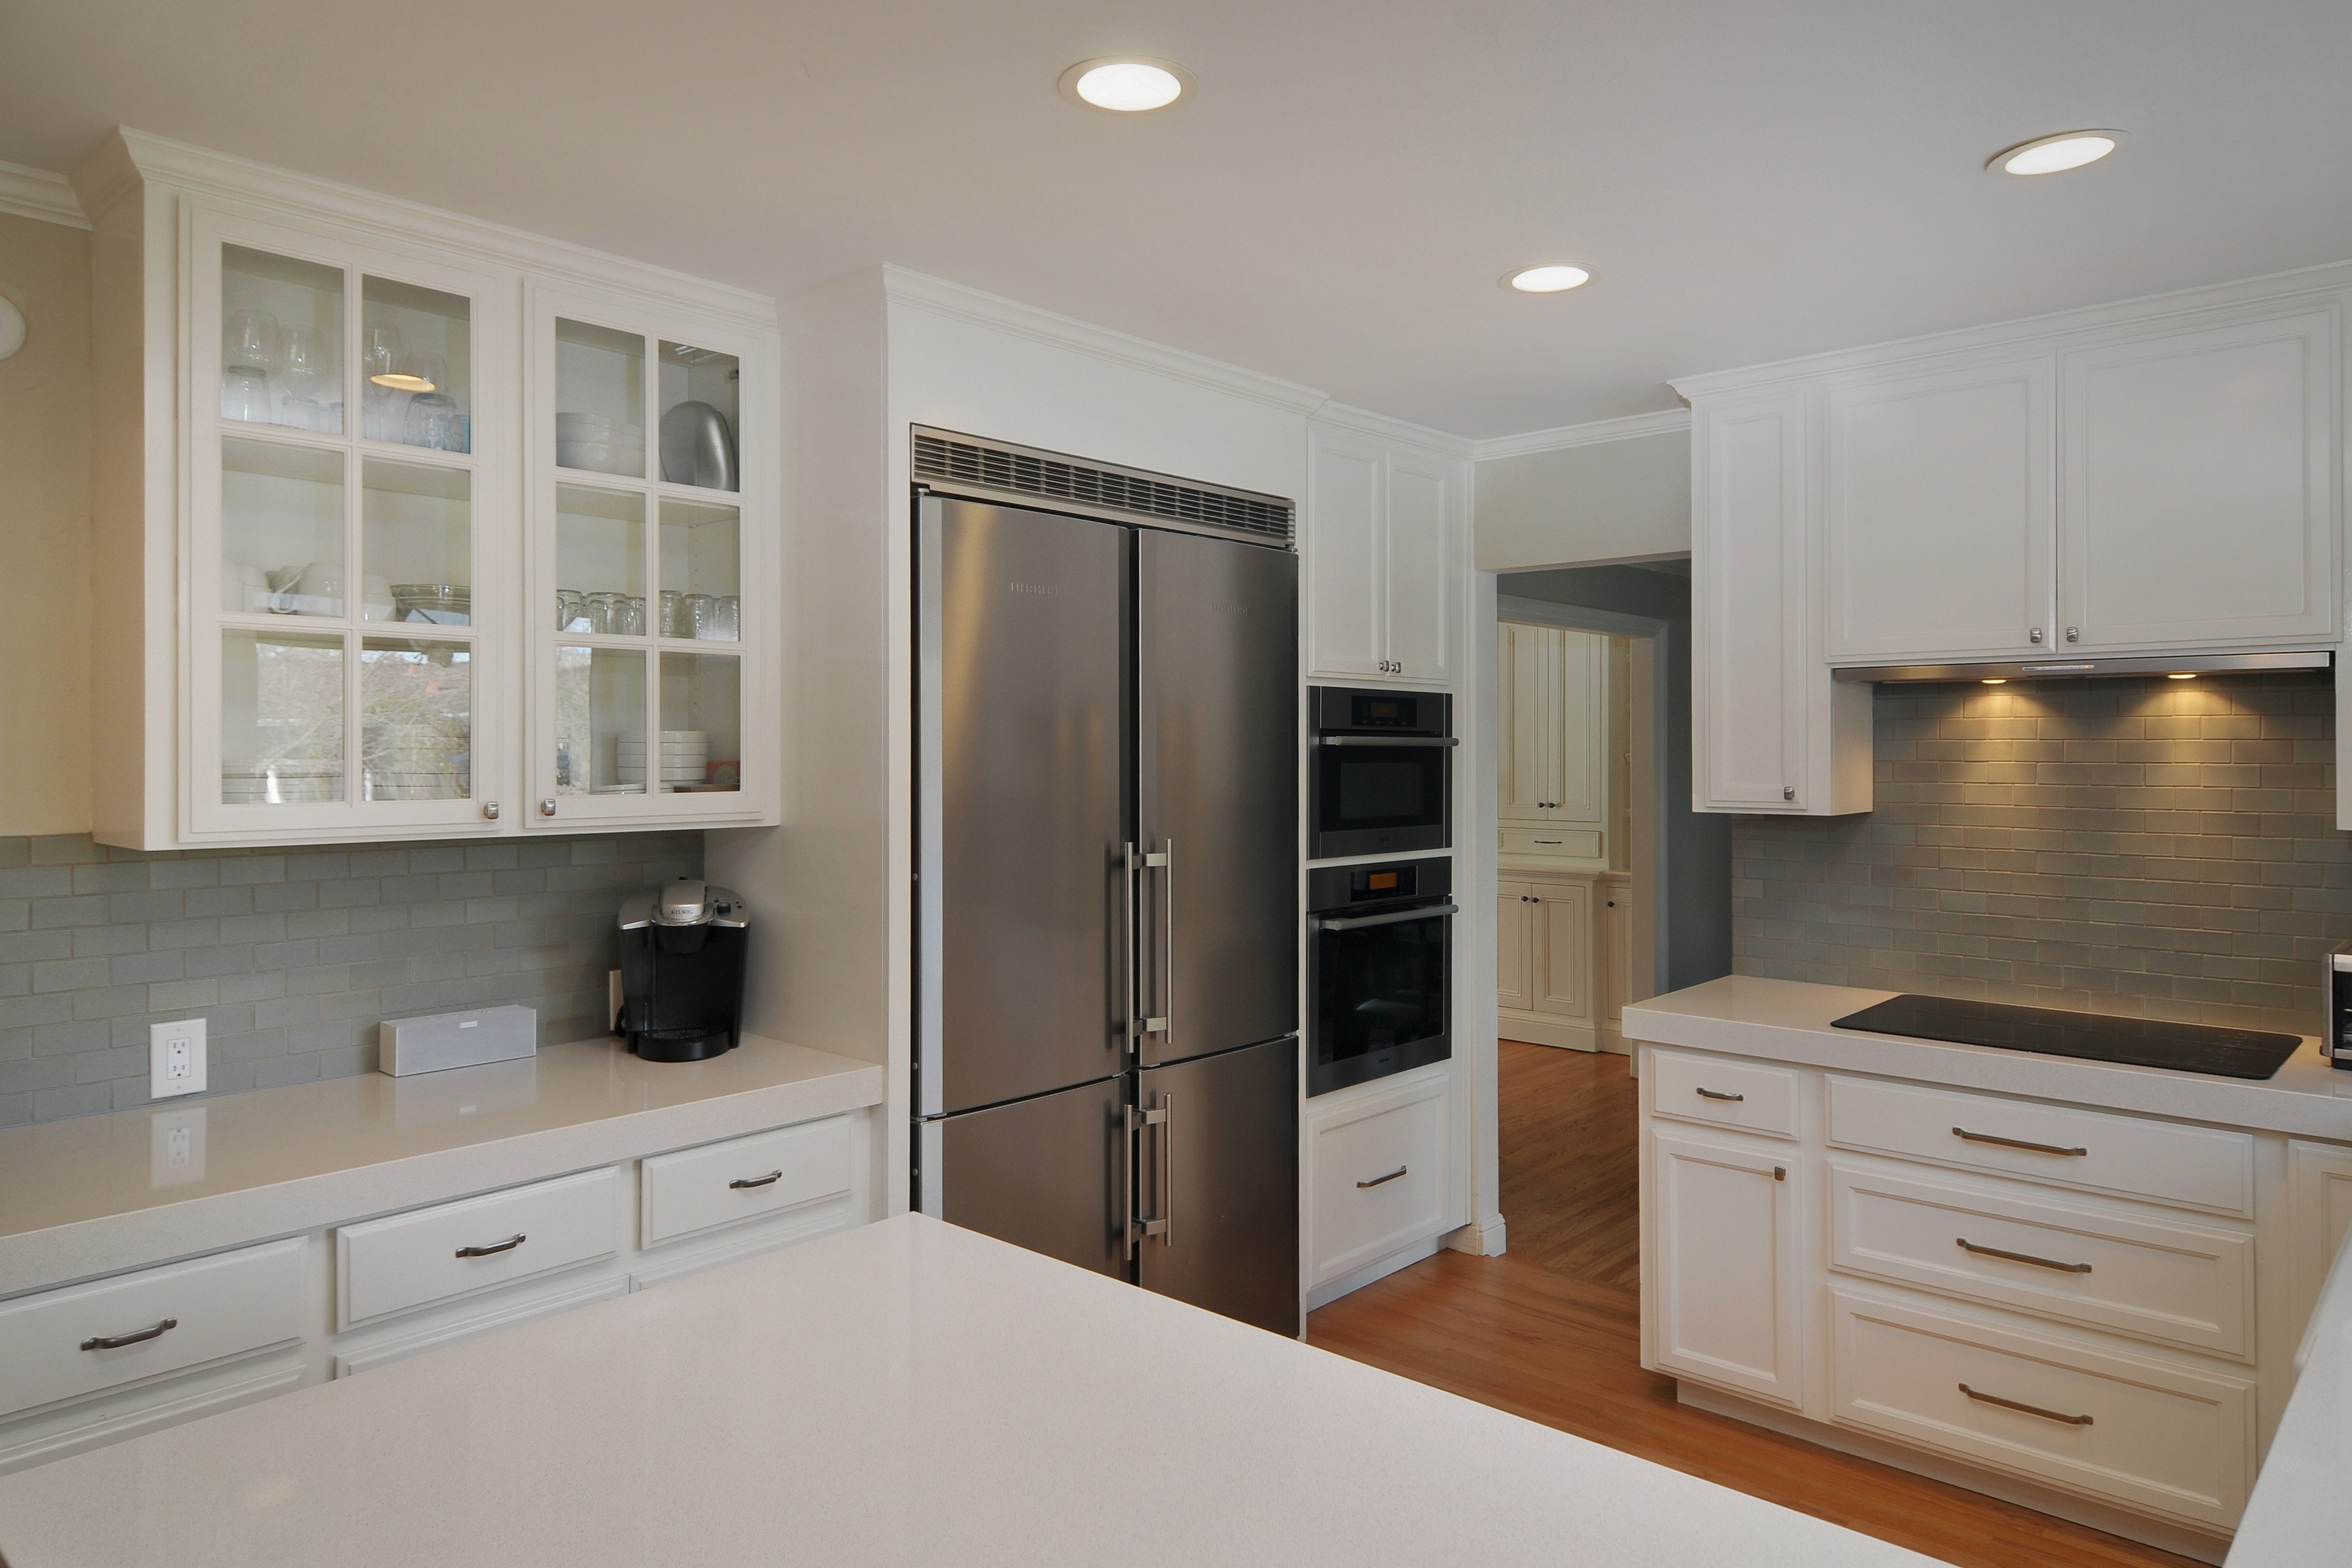 006 Kitchen - Exquisite, expansive, remodeled Belwood home - 127 Belhaven Drive, Los Gatos